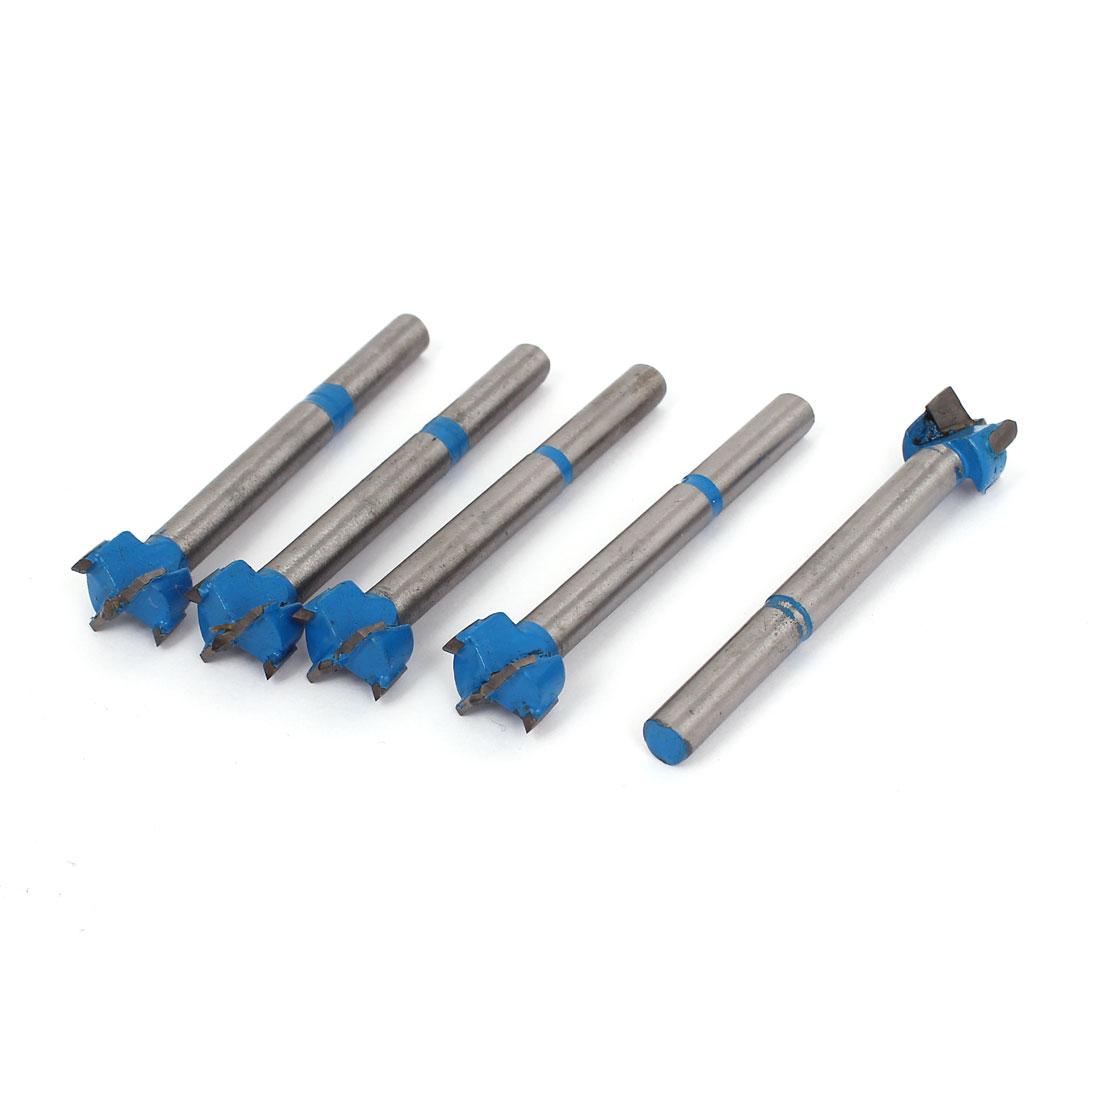 5 Pcs 15mm Hinge Forstner Drill Bit Wood Boring Hole Saw Cutter for Carpenter